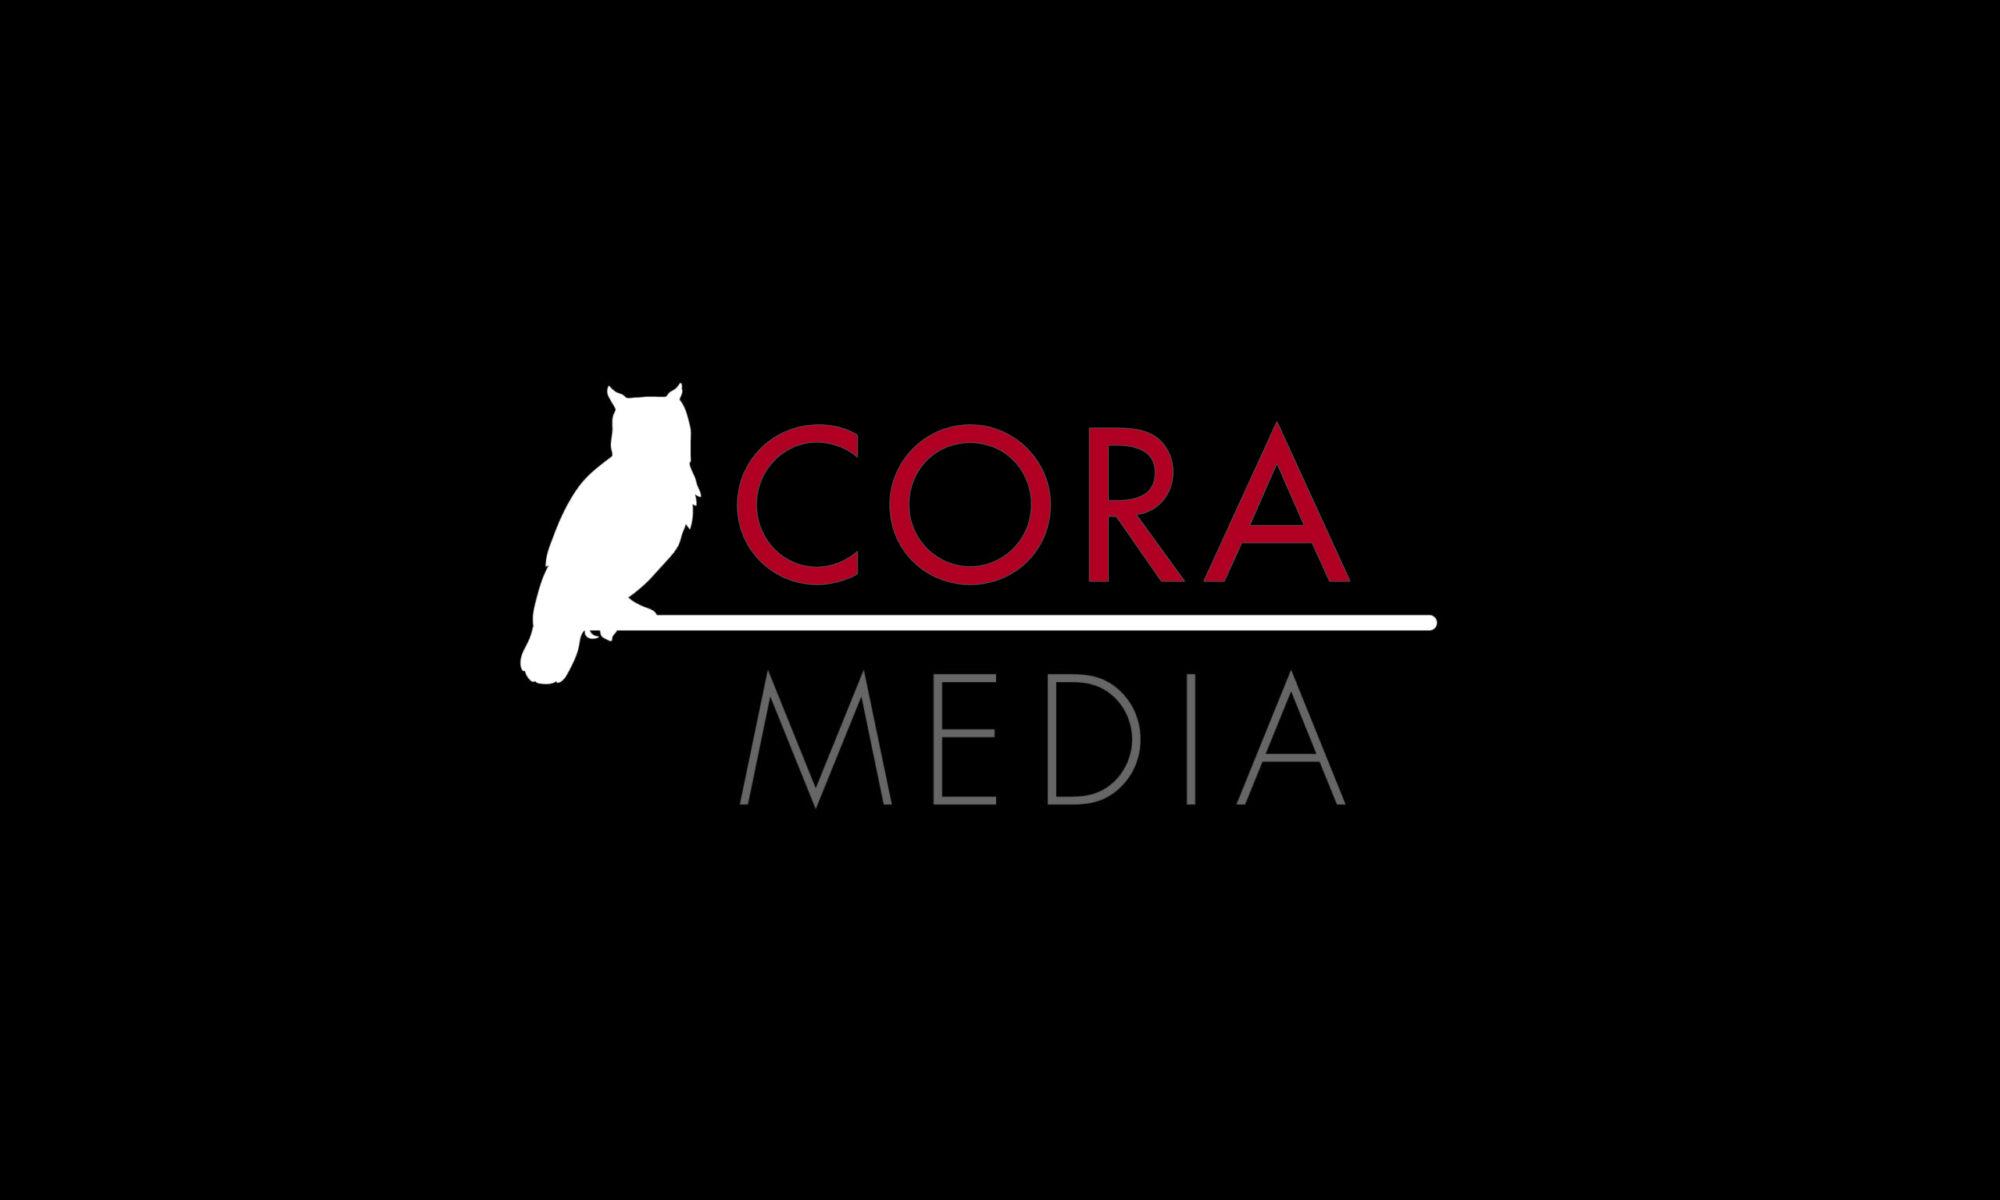 Cora Media